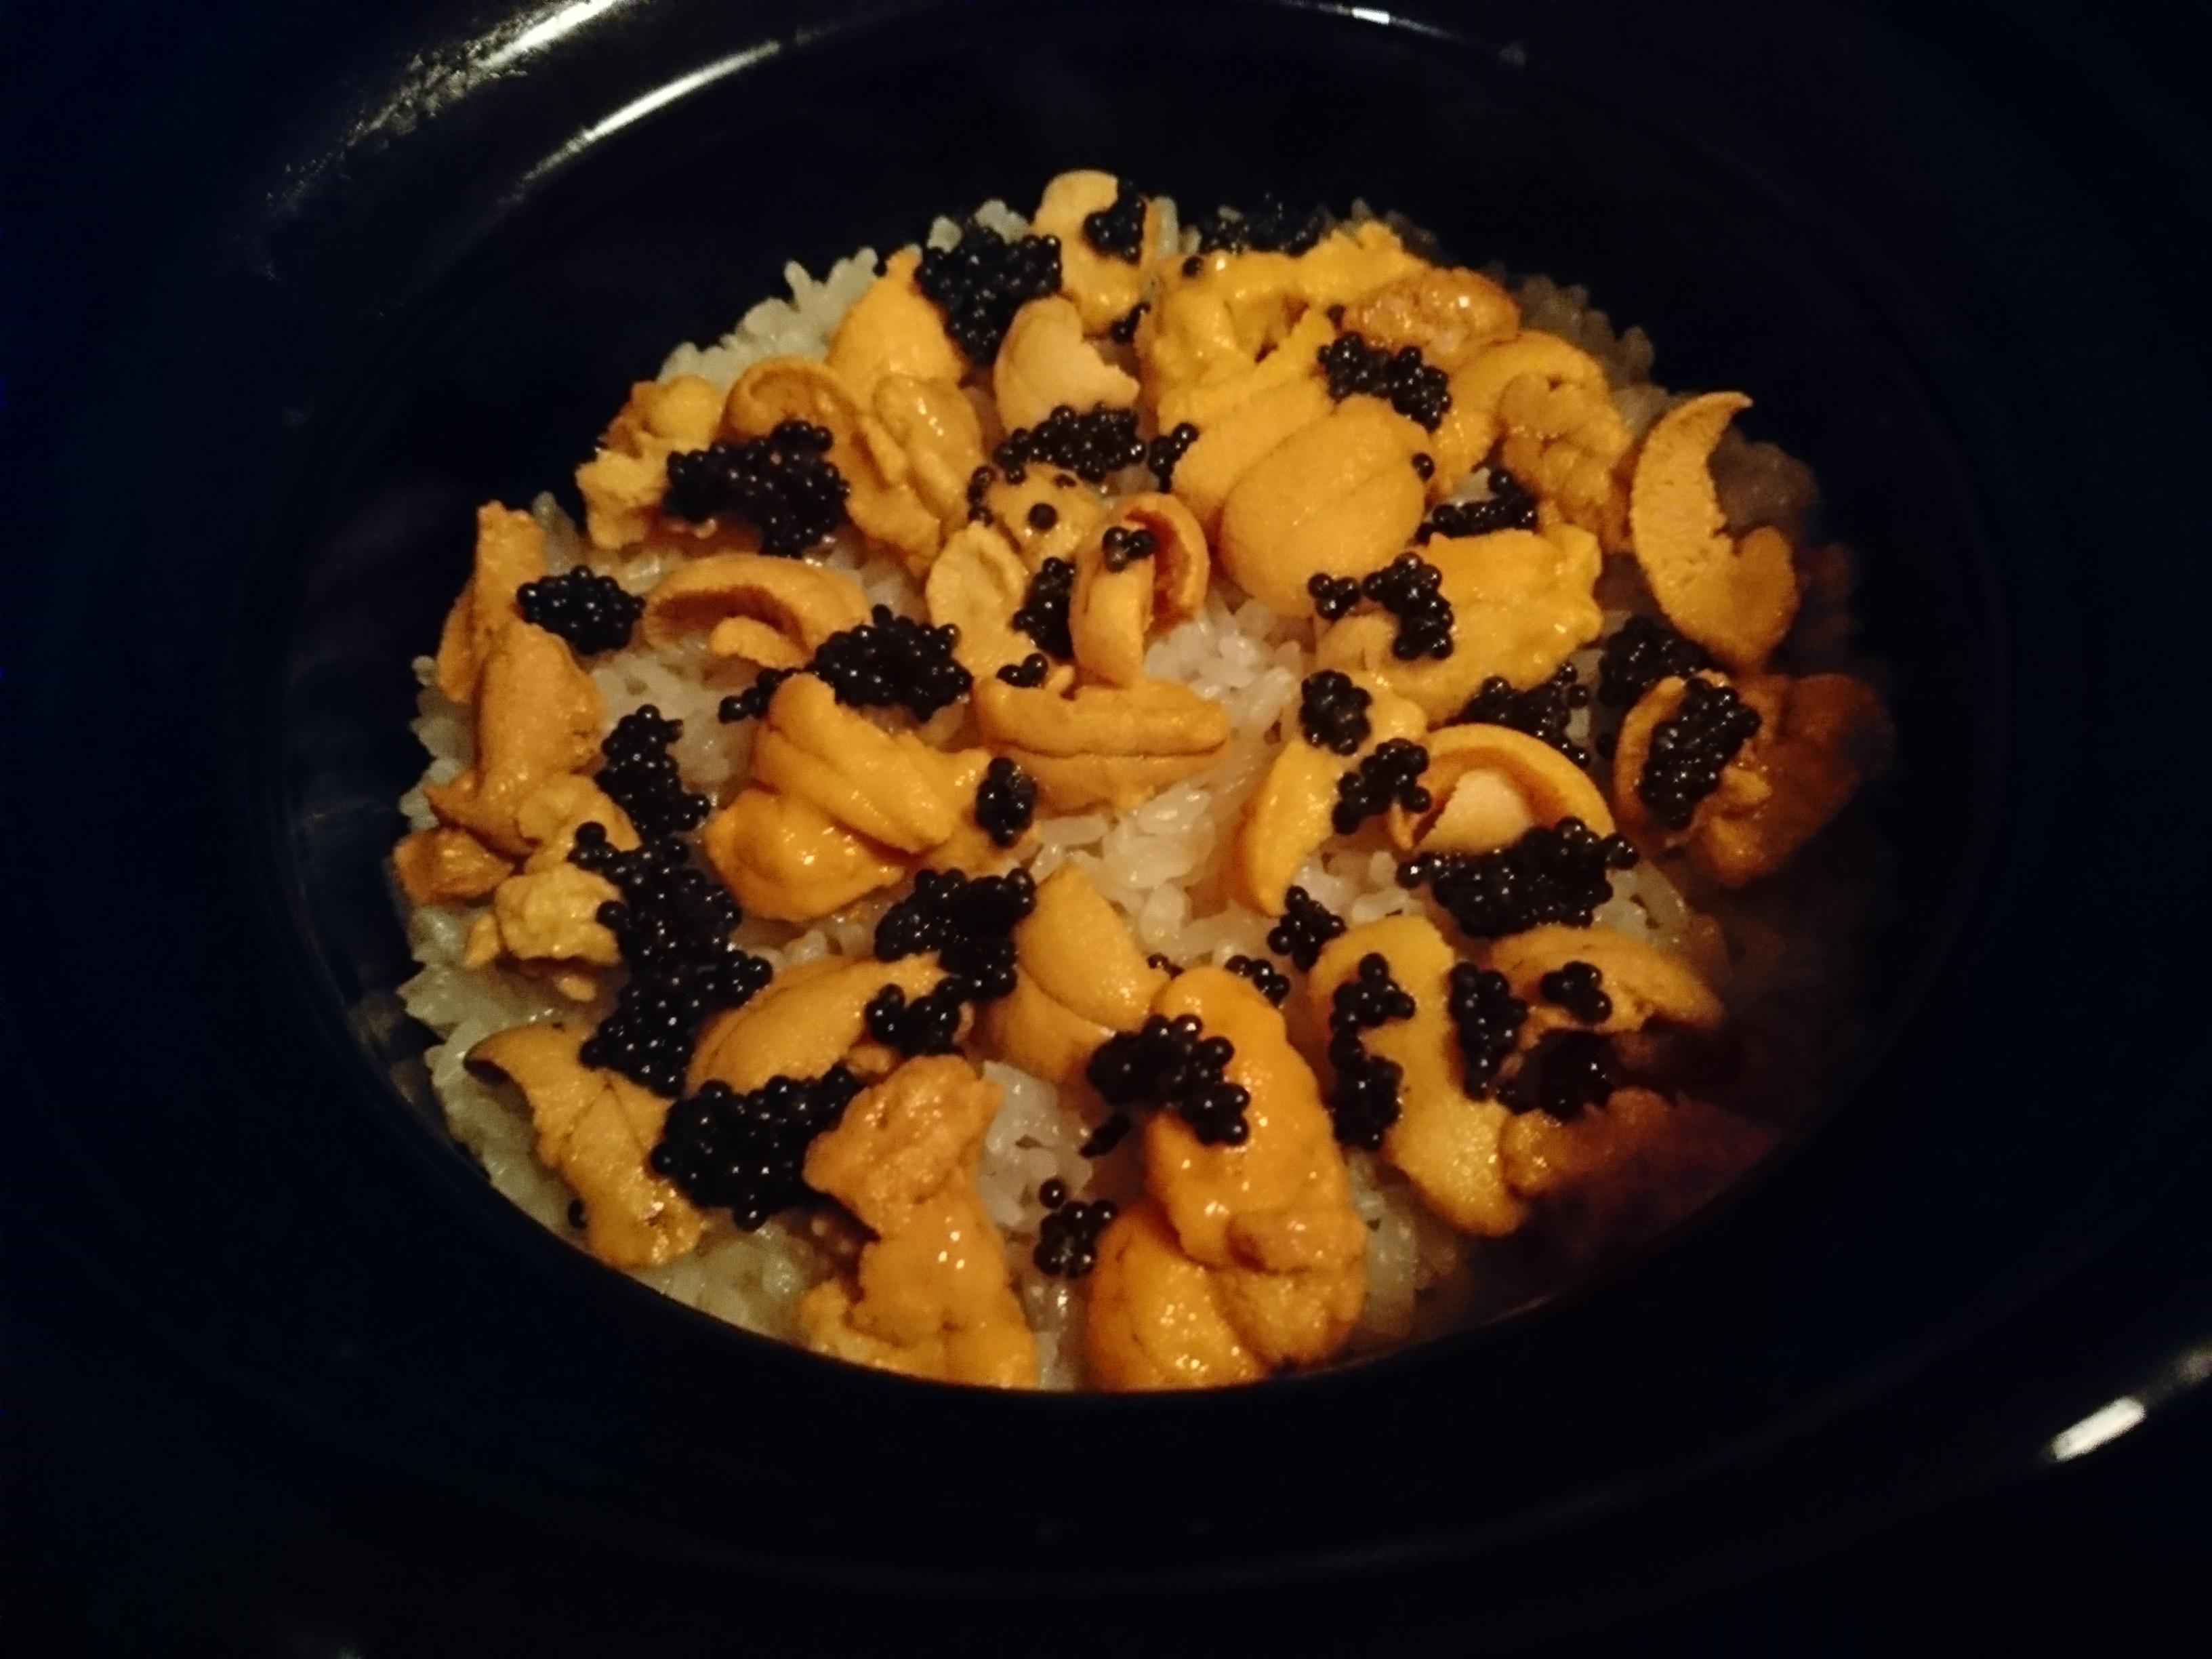 ウニの炊込みご飯